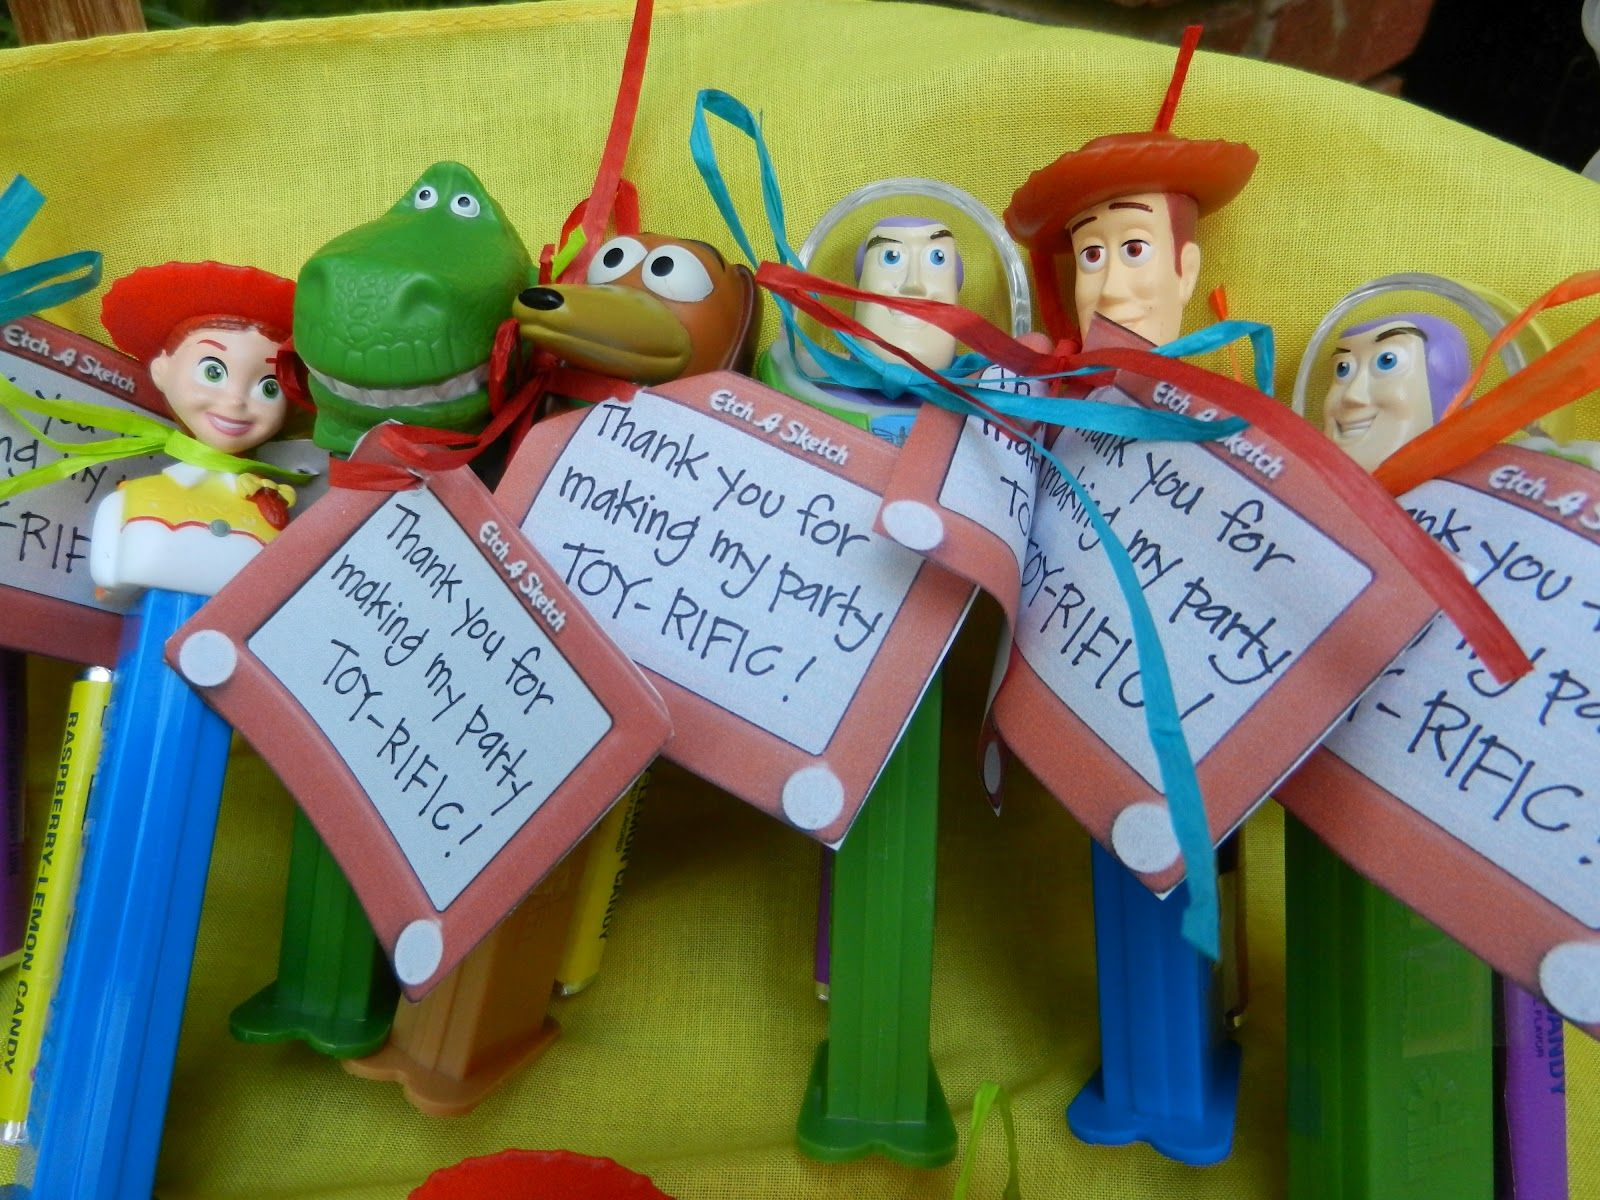 Best 25 Toy story birthday ideas on Pinterest